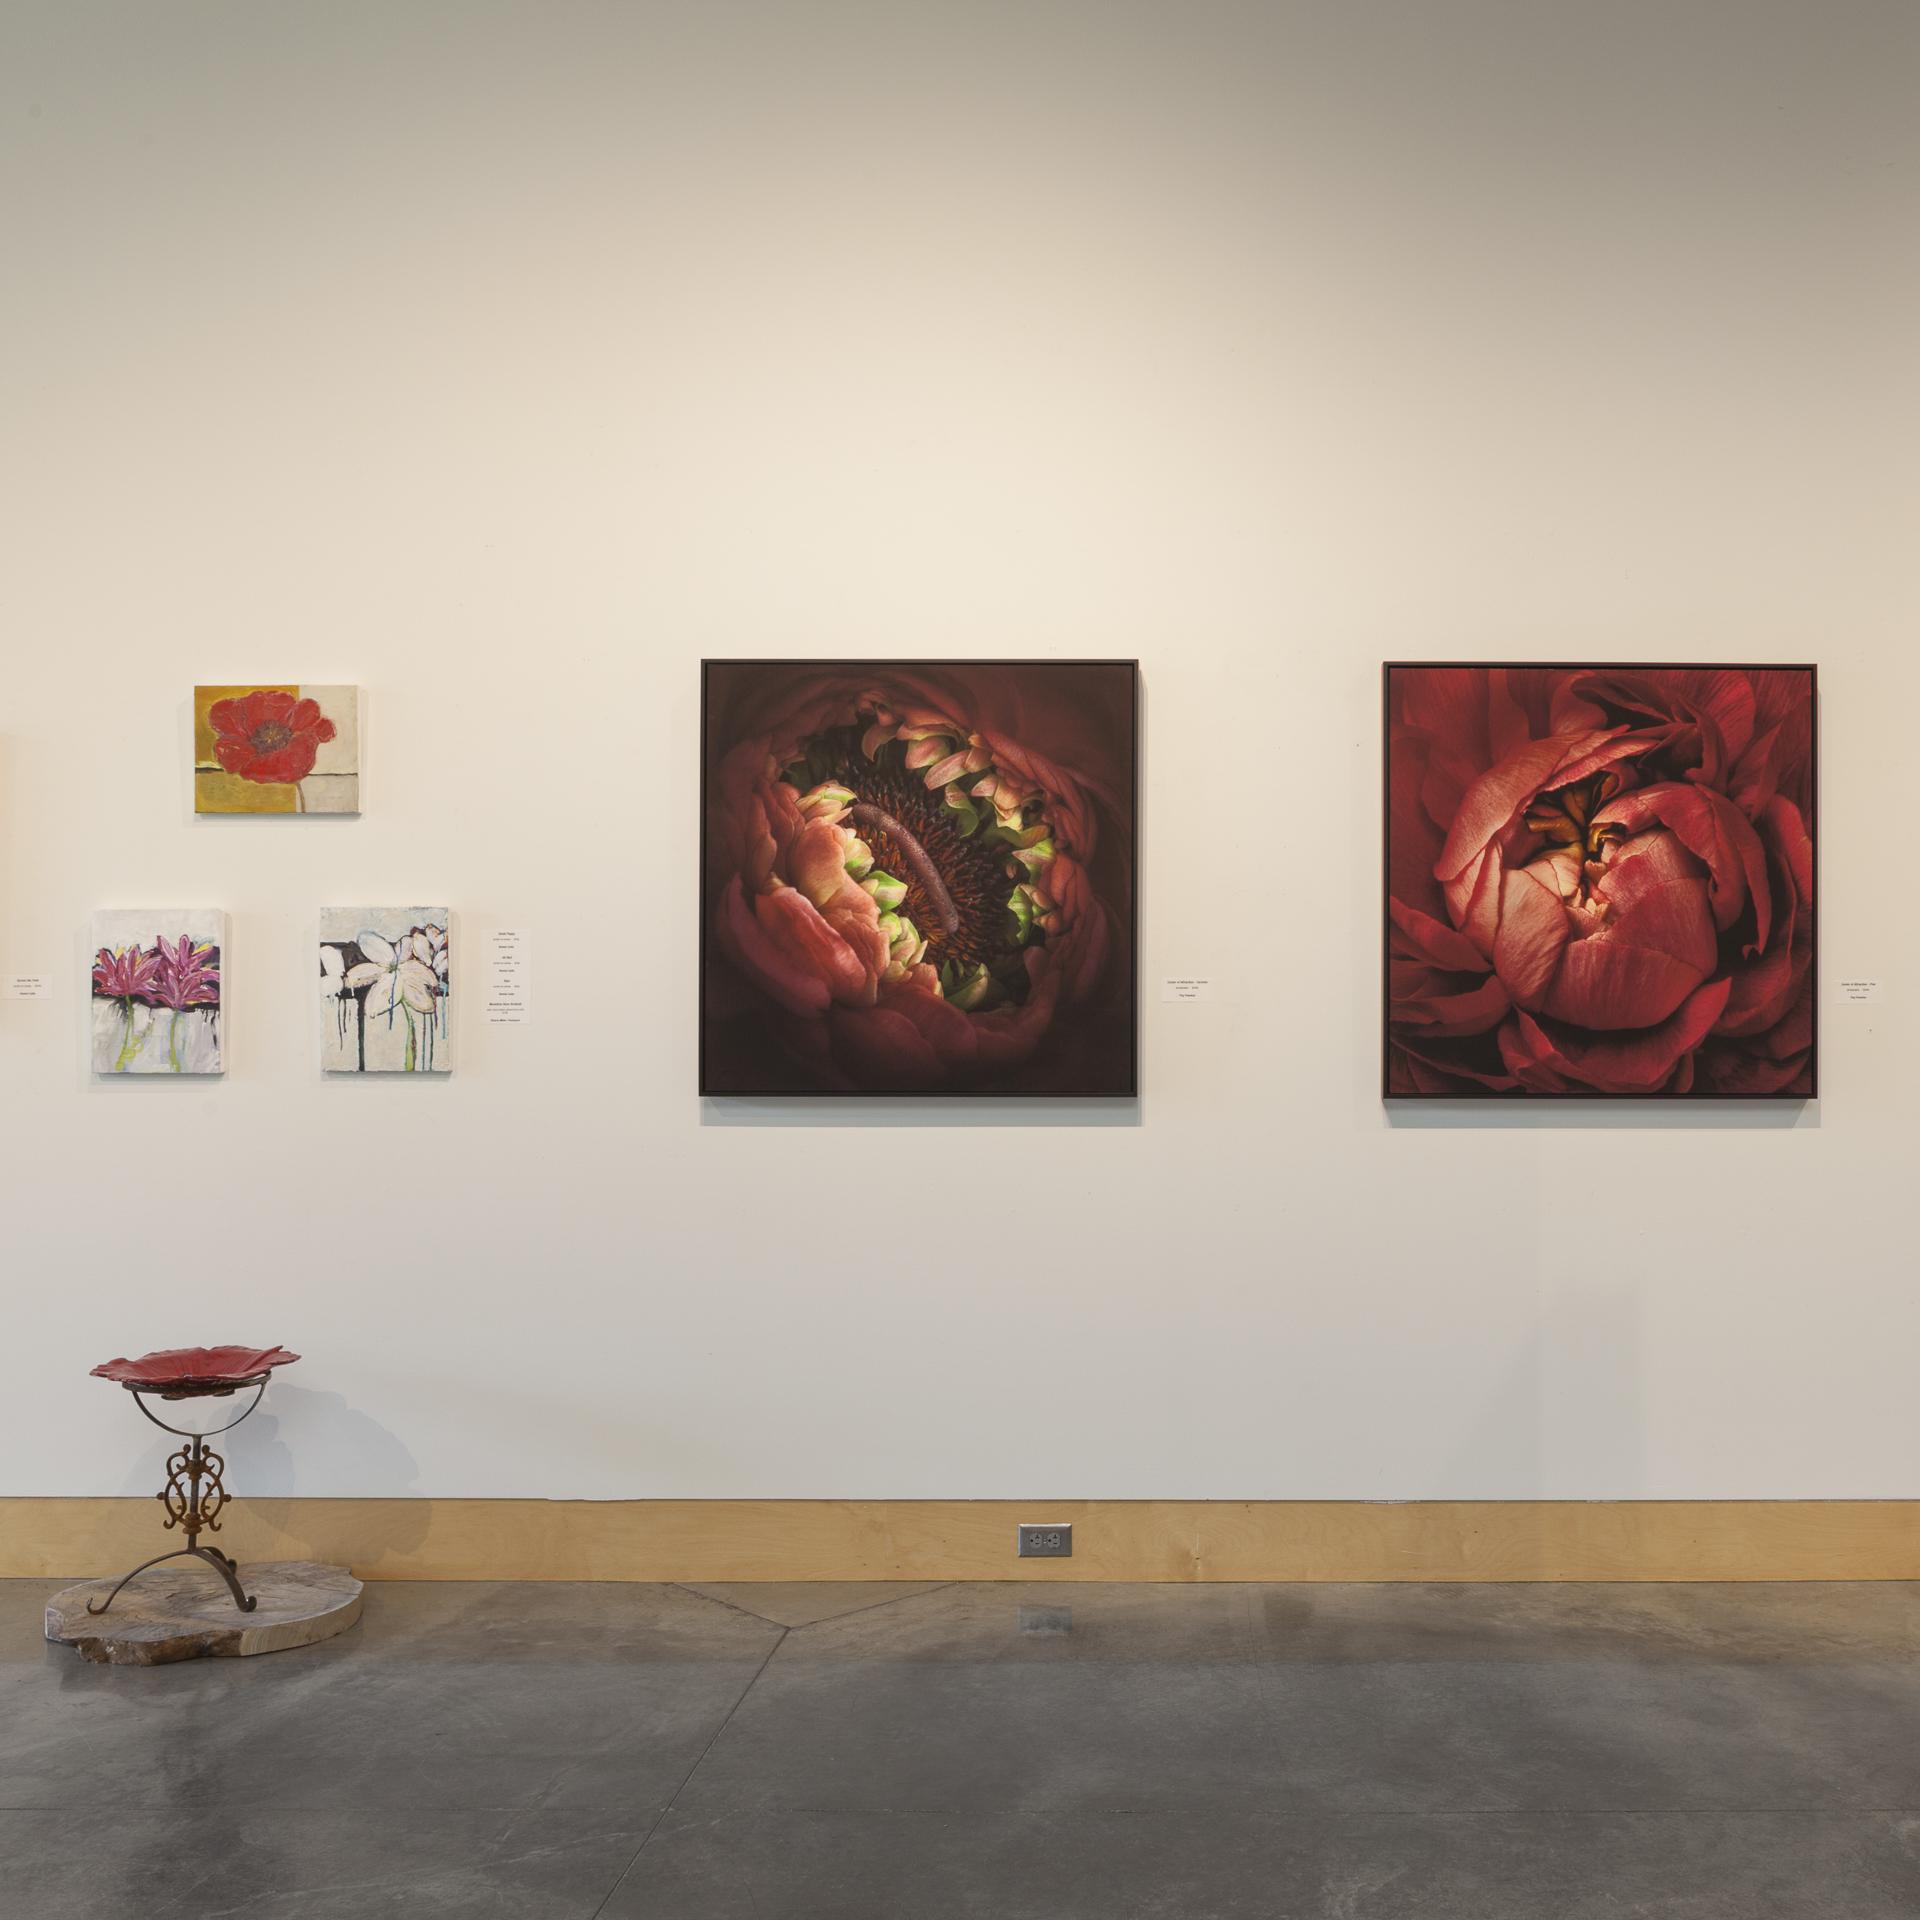 Minnetonka Center for the Arts, Art of the Garden Exhibit